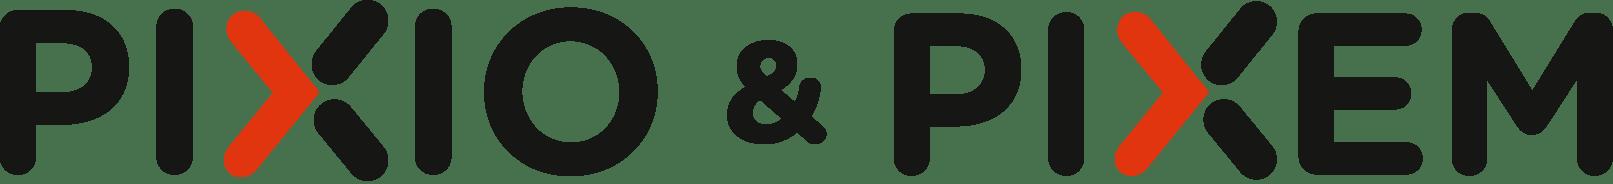 PIXIO and PIXEM auto-follow camera logo